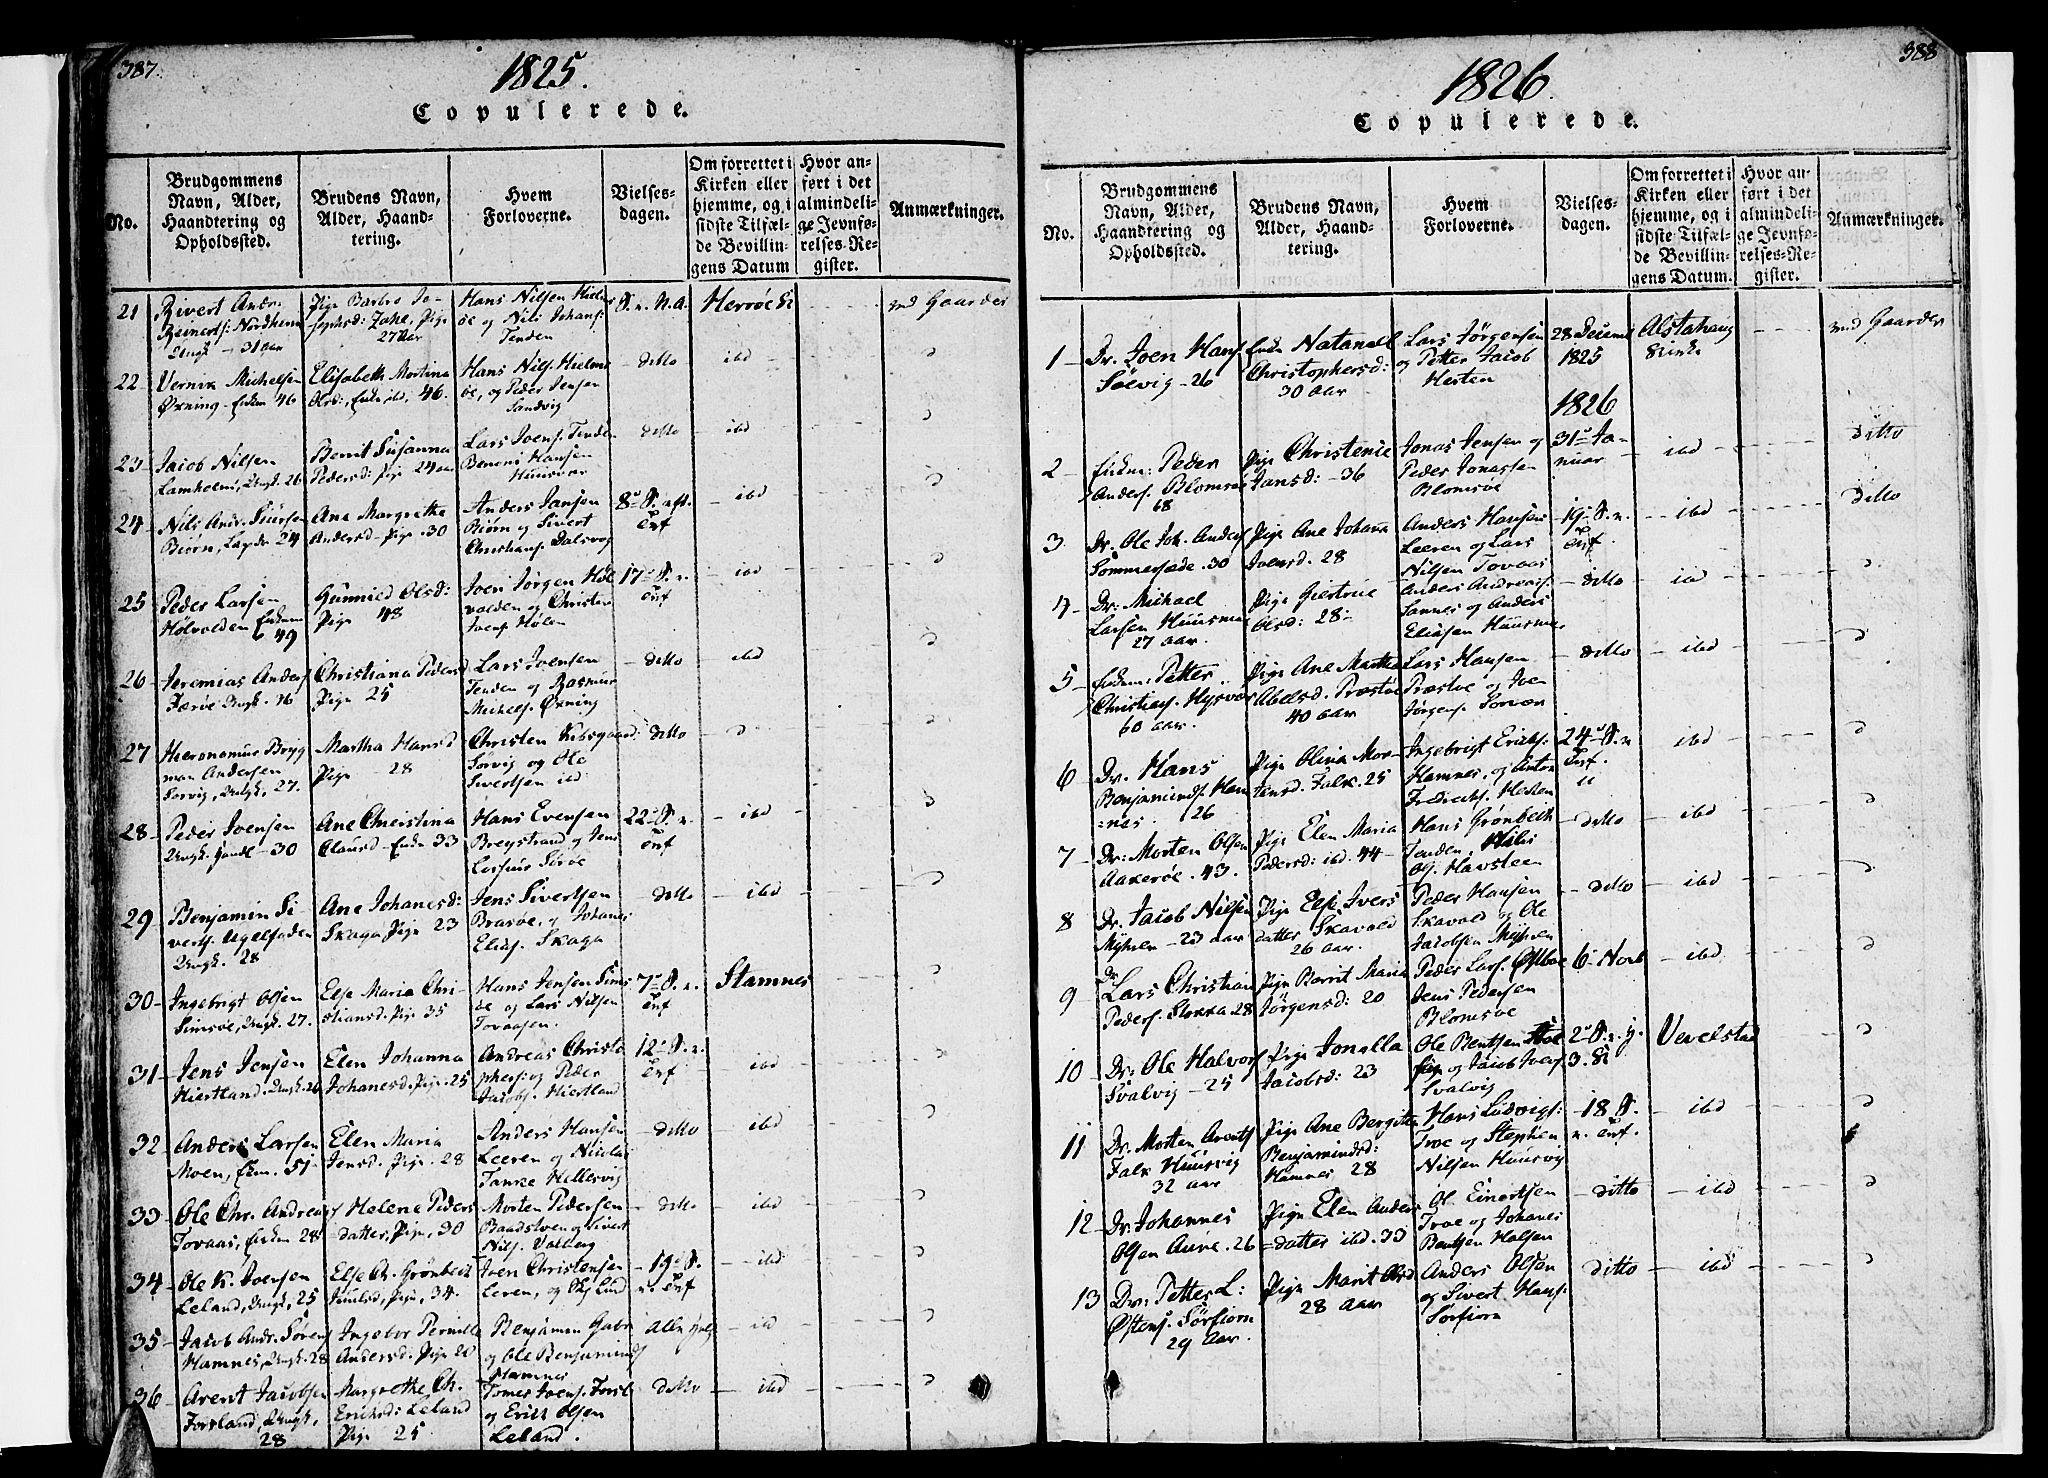 SAT, Ministerialprotokoller, klokkerbøker og fødselsregistre - Nordland, 830/L0445: Ministerialbok nr. 830A09, 1820-1830, s. 387-388